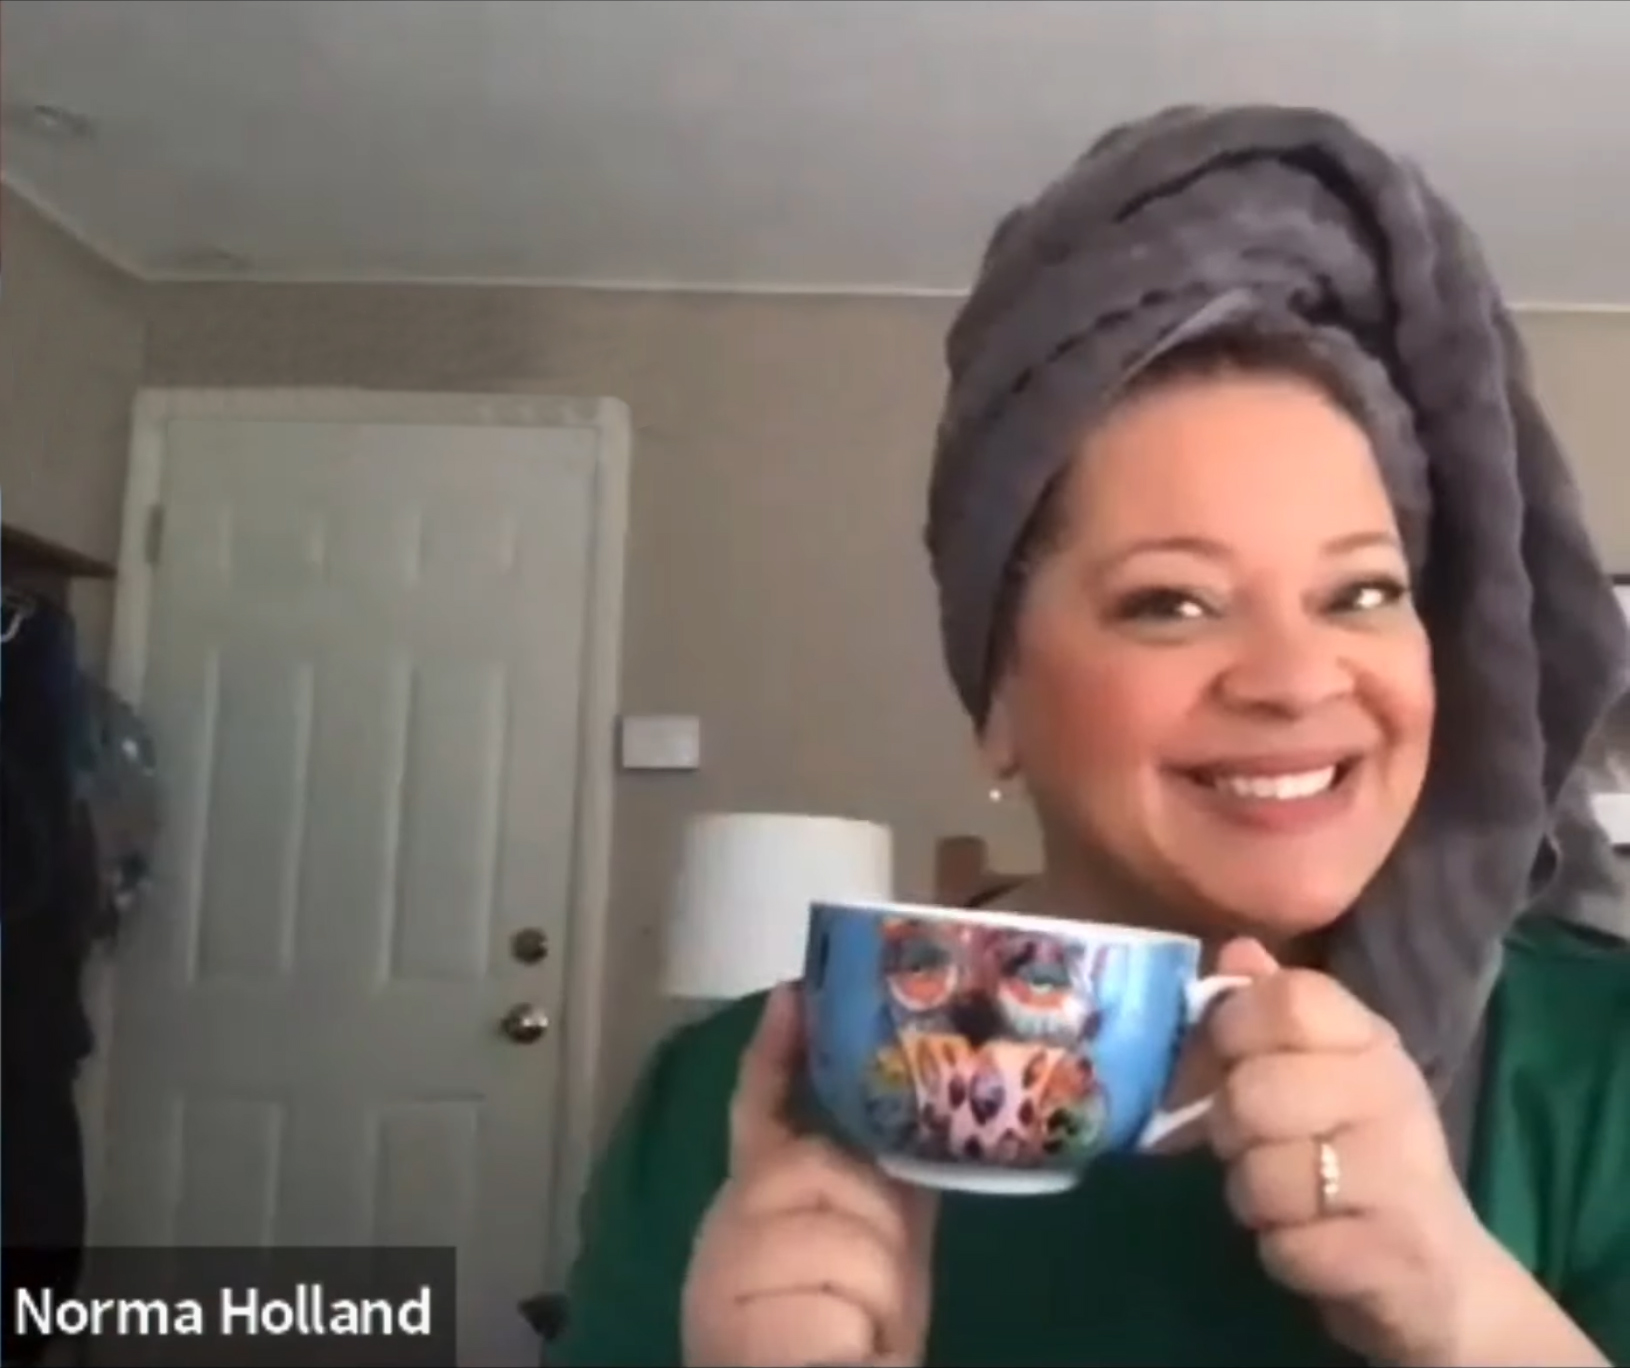 Norma Holland